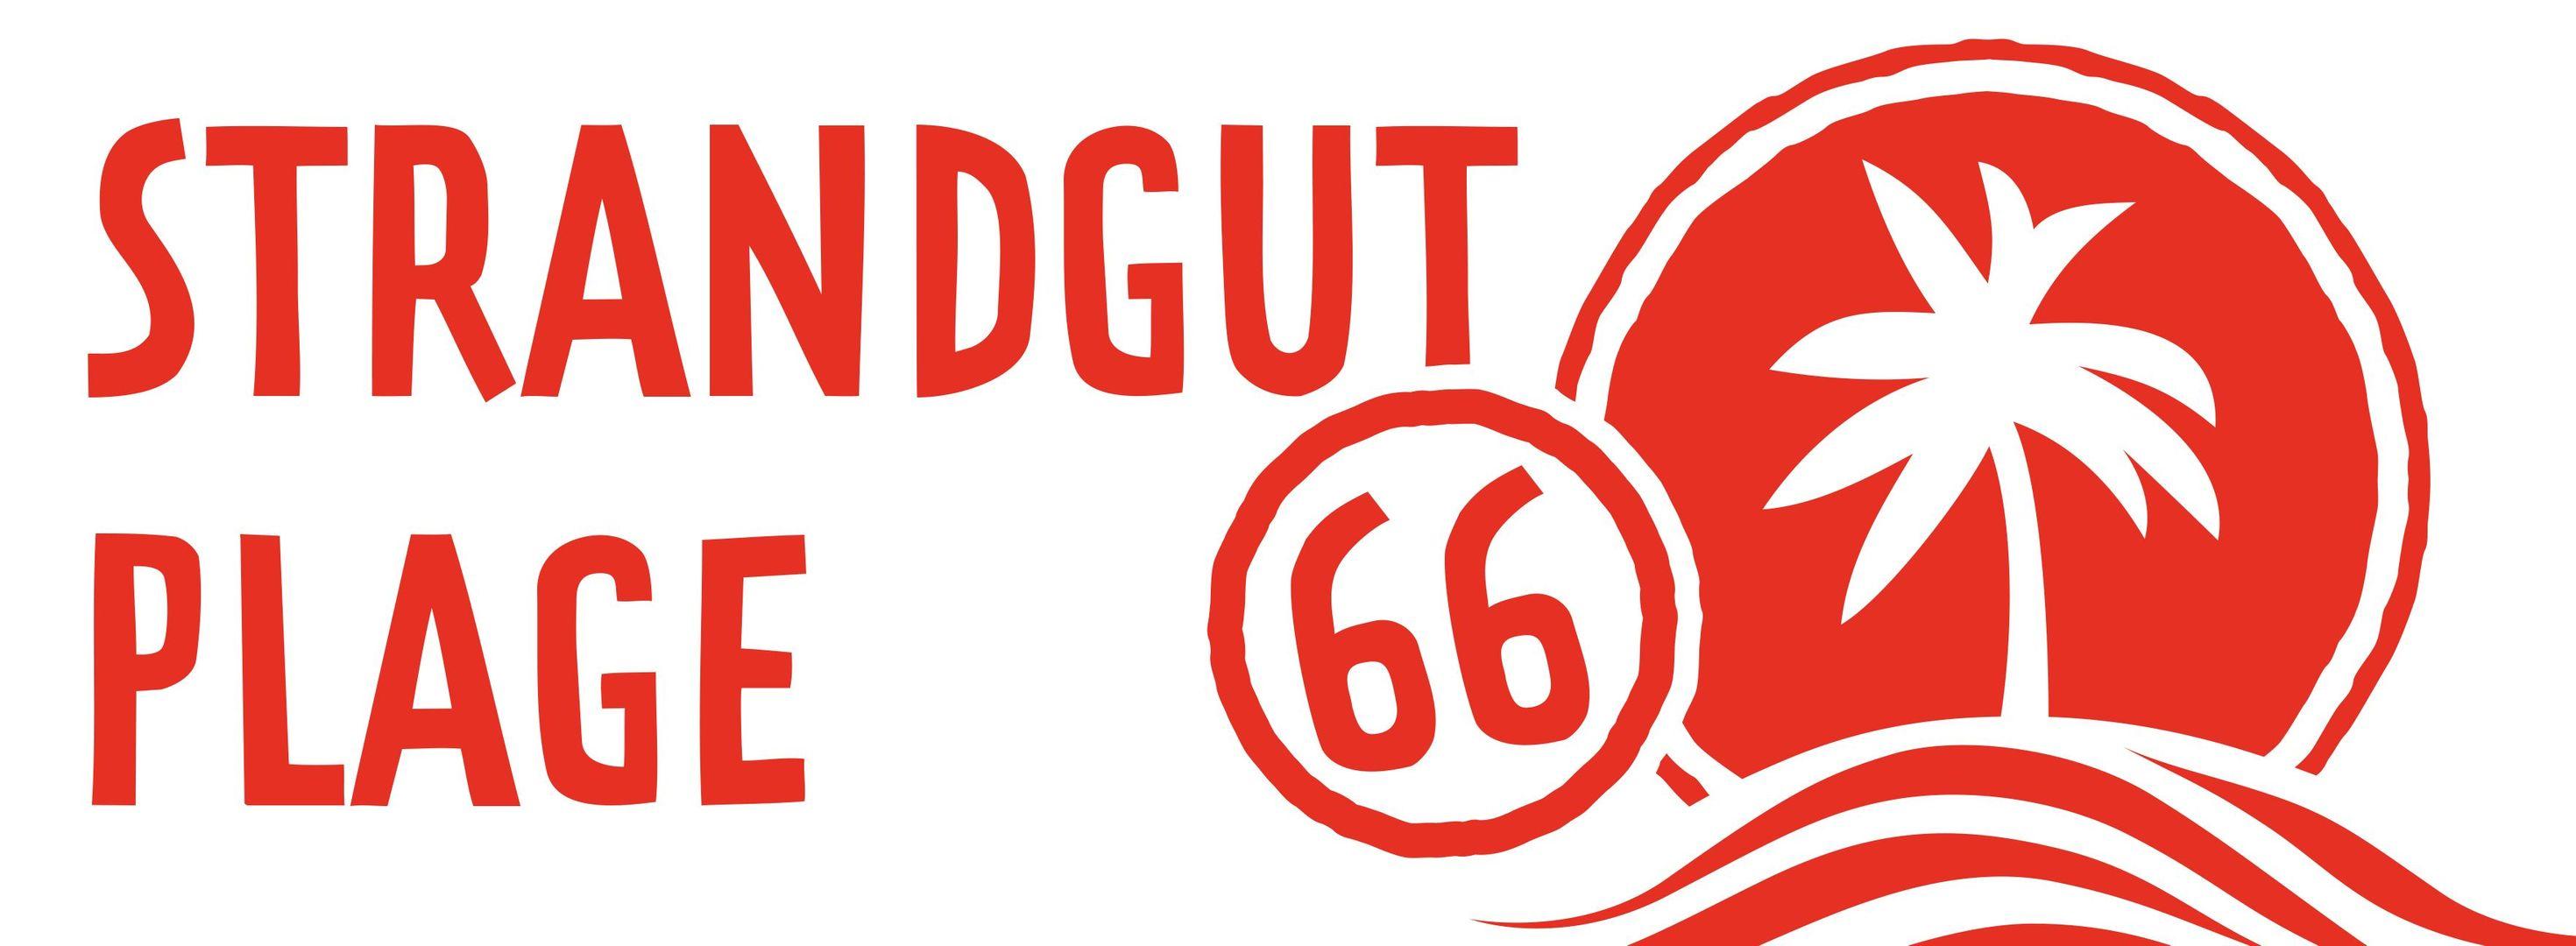 StrandGut66 Speisen - Speisekarte | Essgut Gifiz